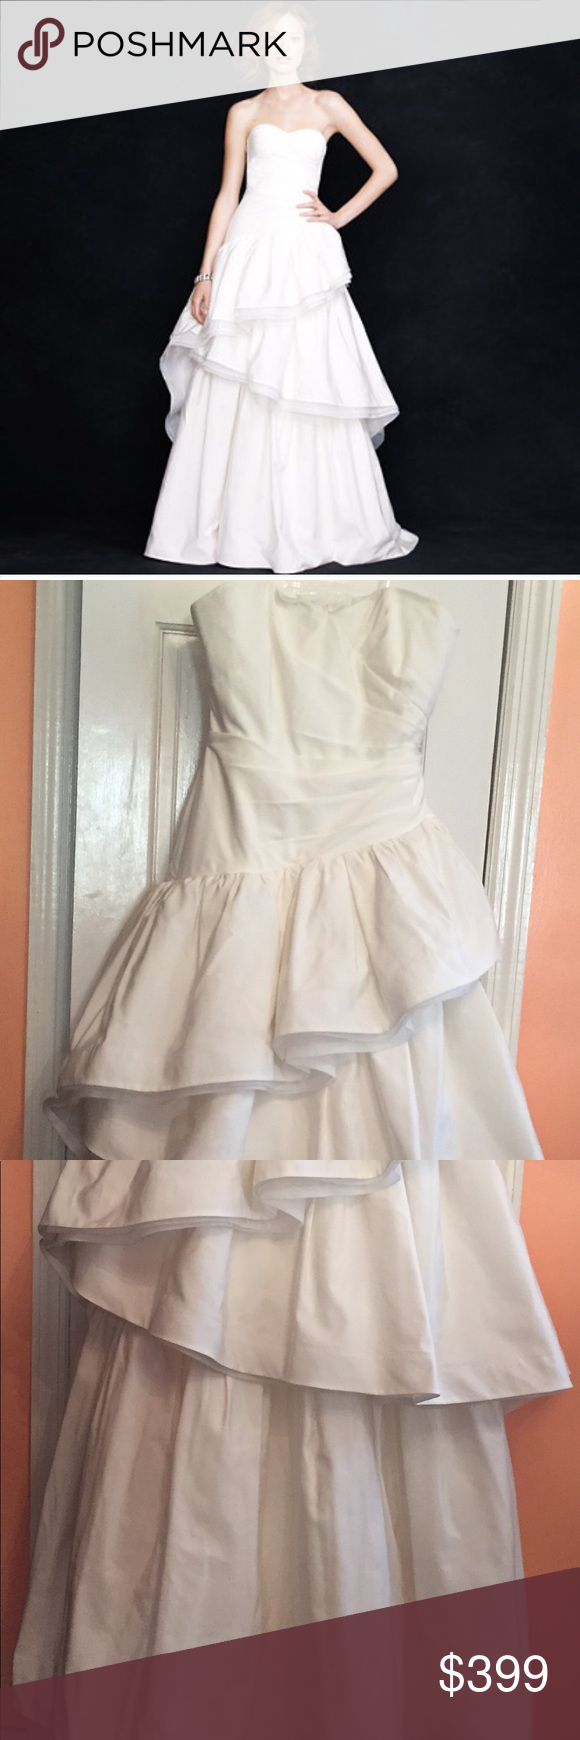 JCrew ESCALIER Gown SIZE 6 Retail 2400 J